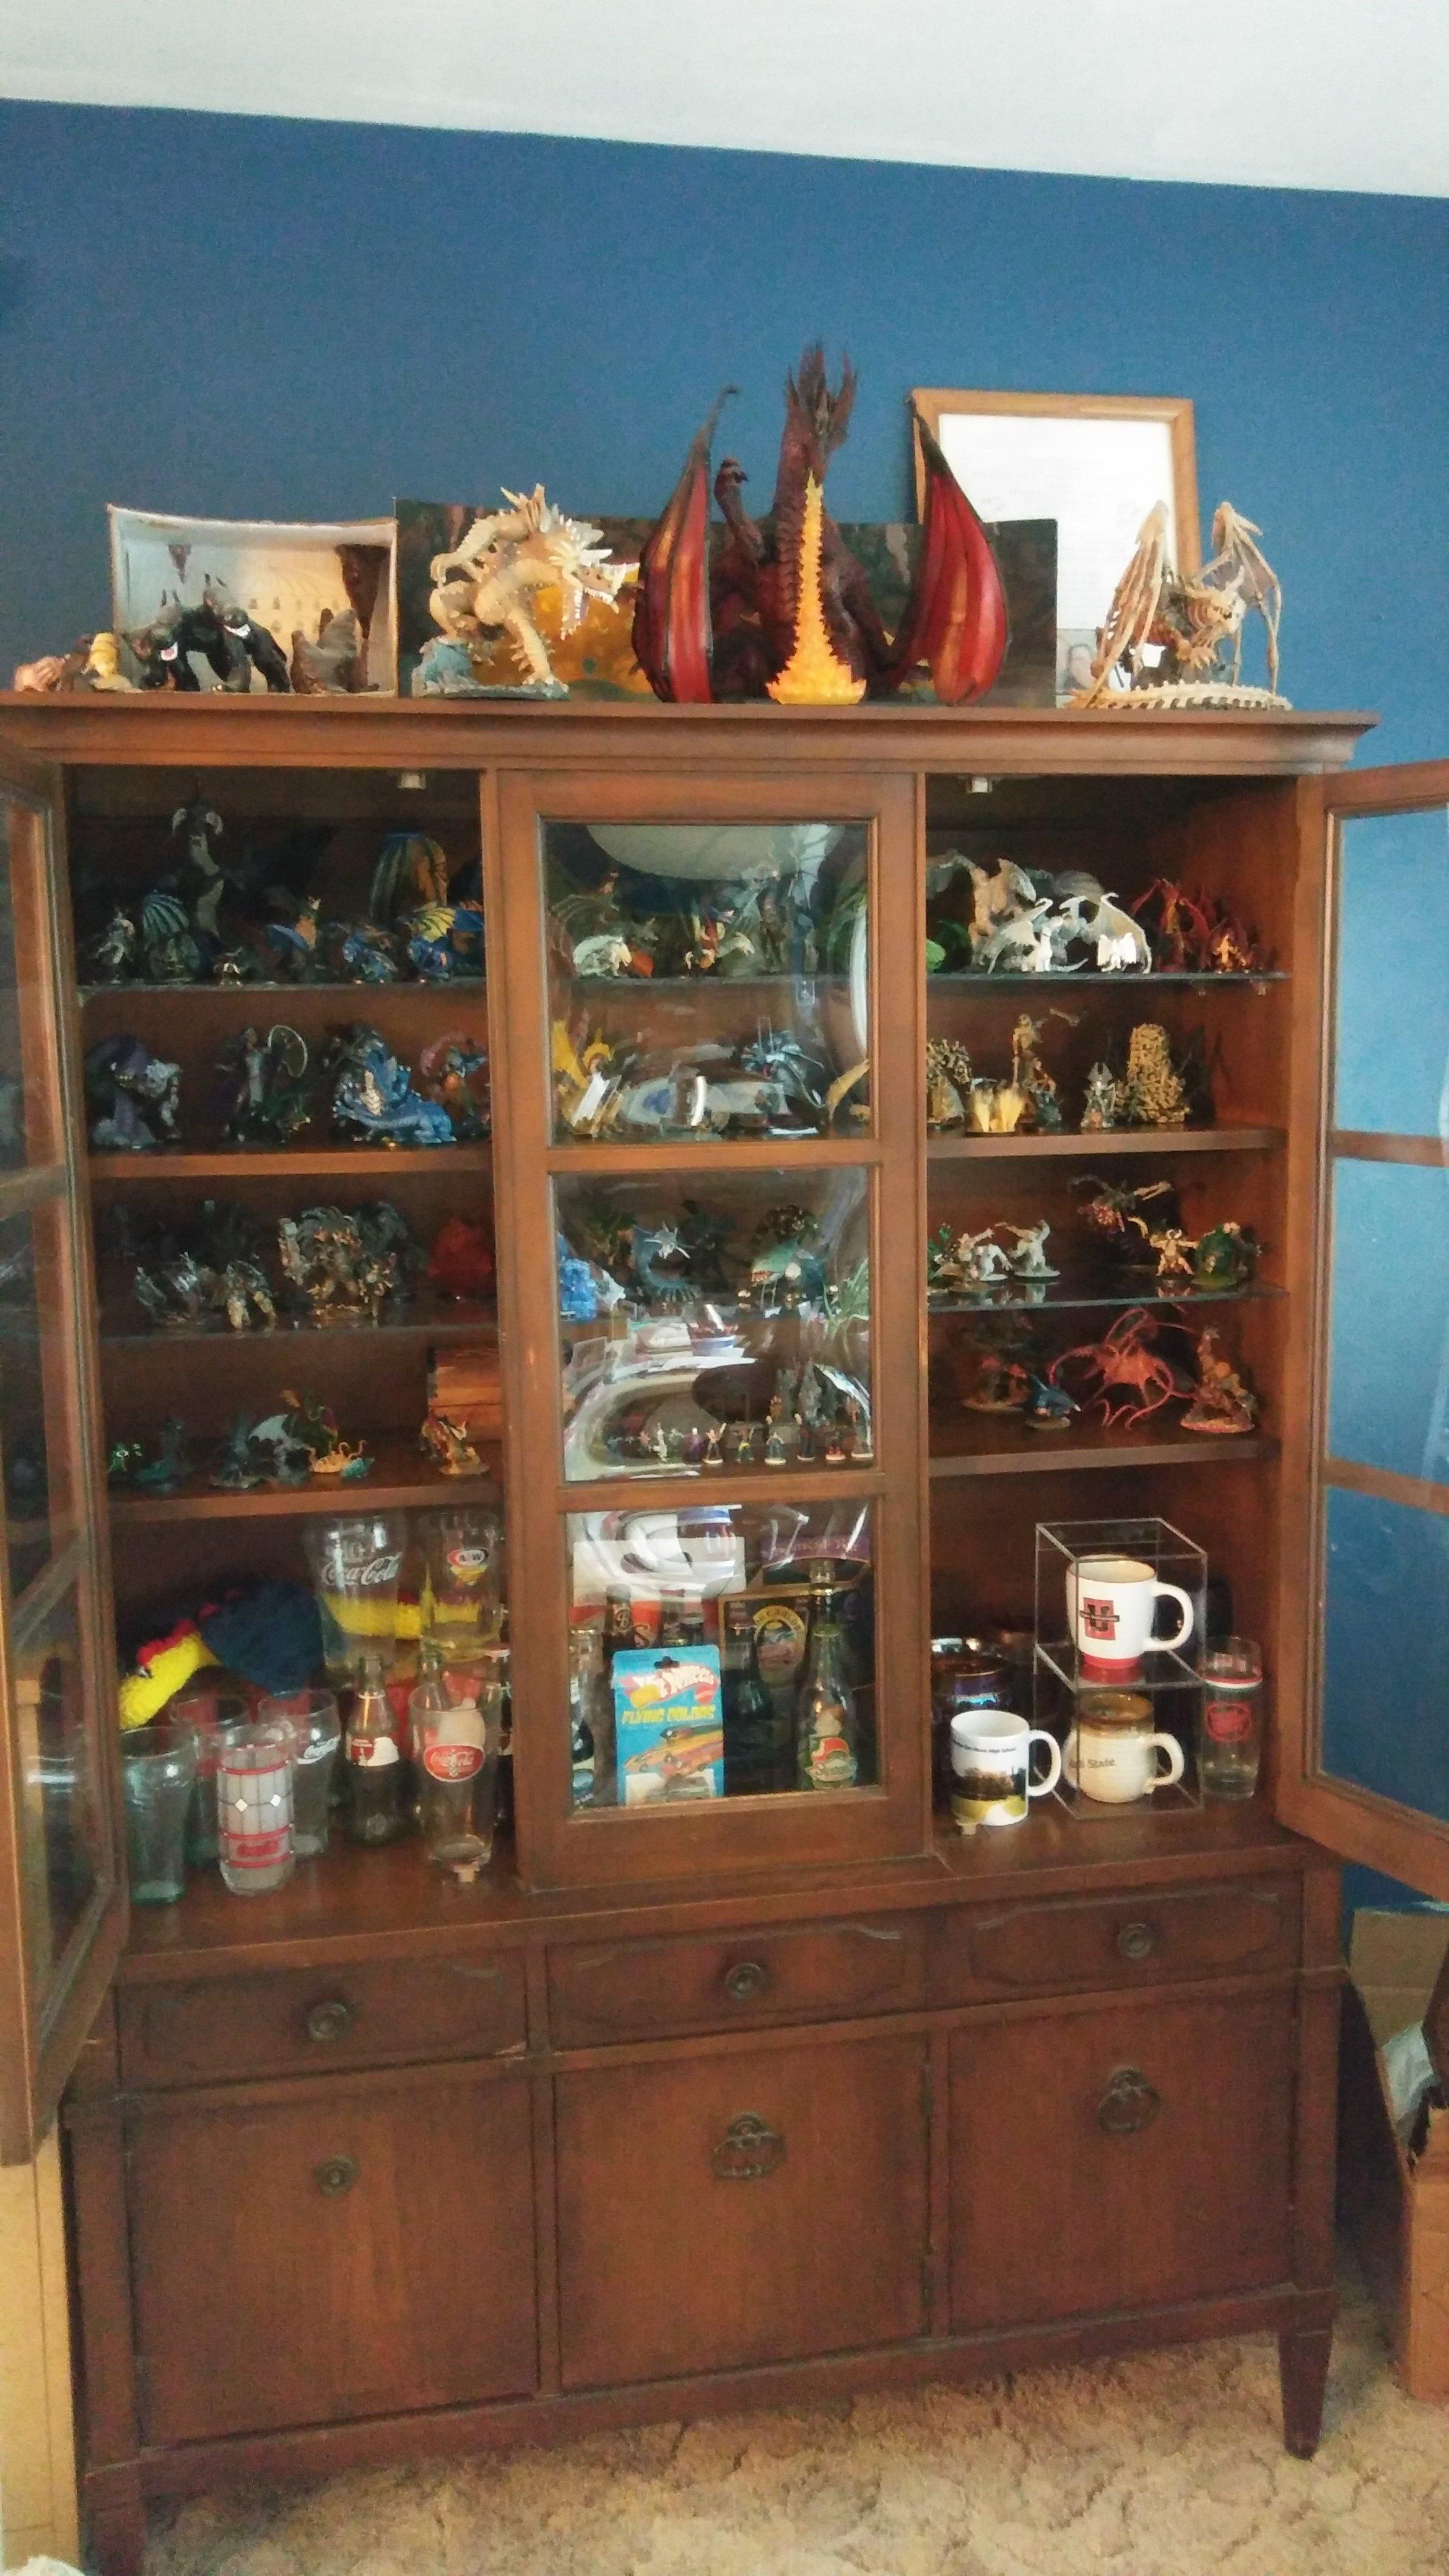 dnd cabinet.jpg